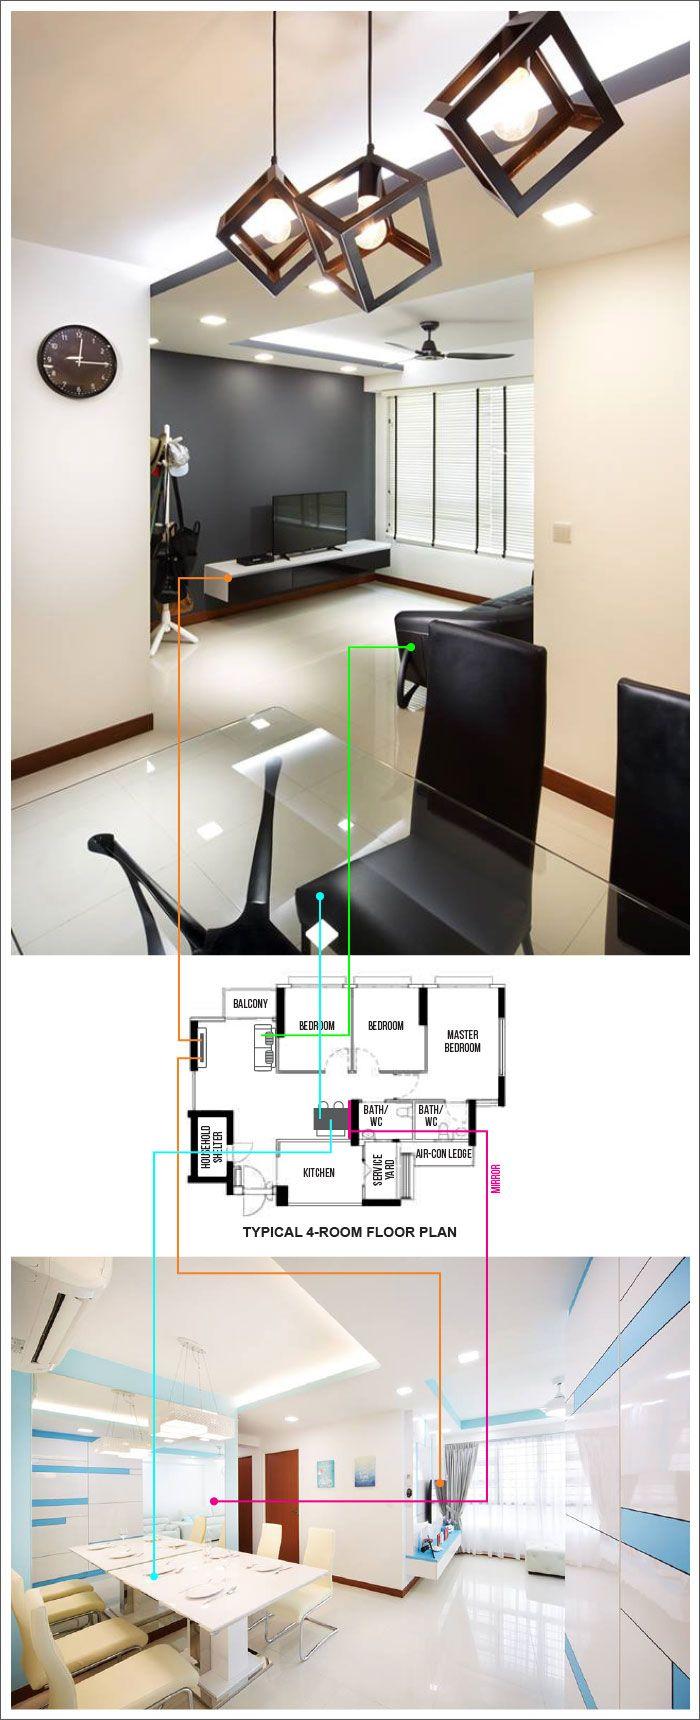 4 room bto master bedroom design   Creative Layout Designs for Compassvale Cape  Layout design